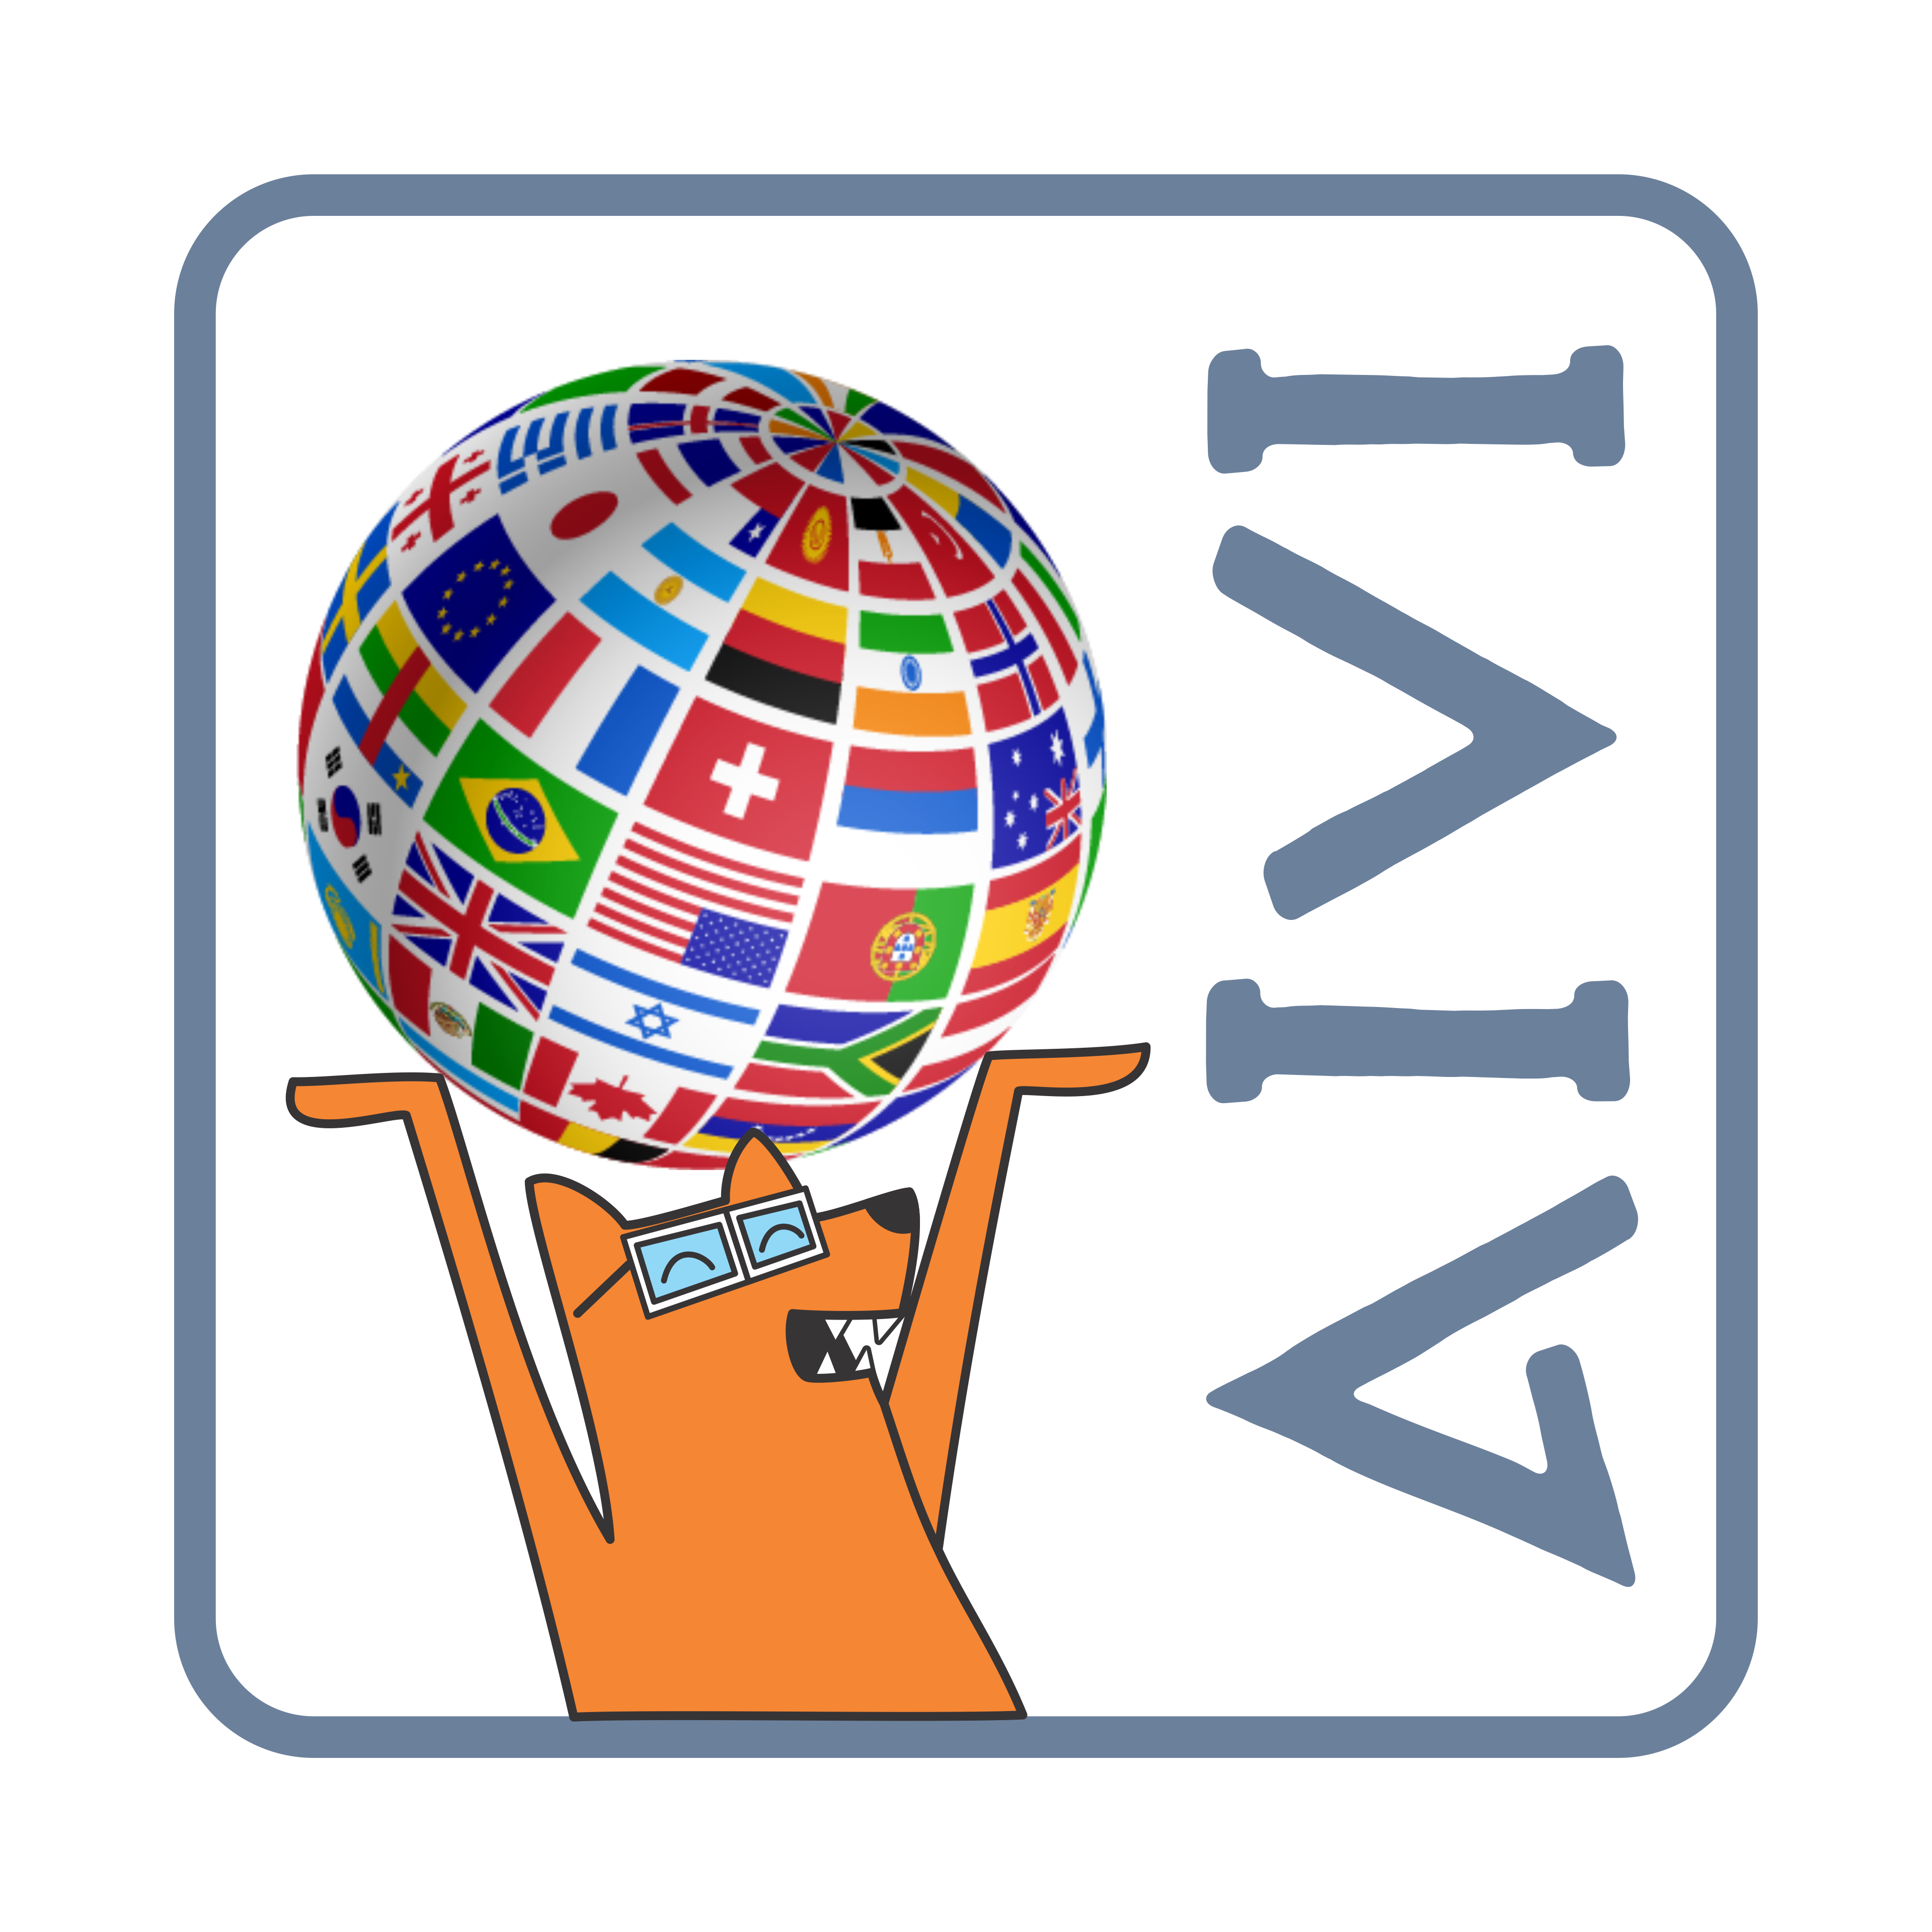 Asociatia Informala a Vocilor pentru Incluziune logo